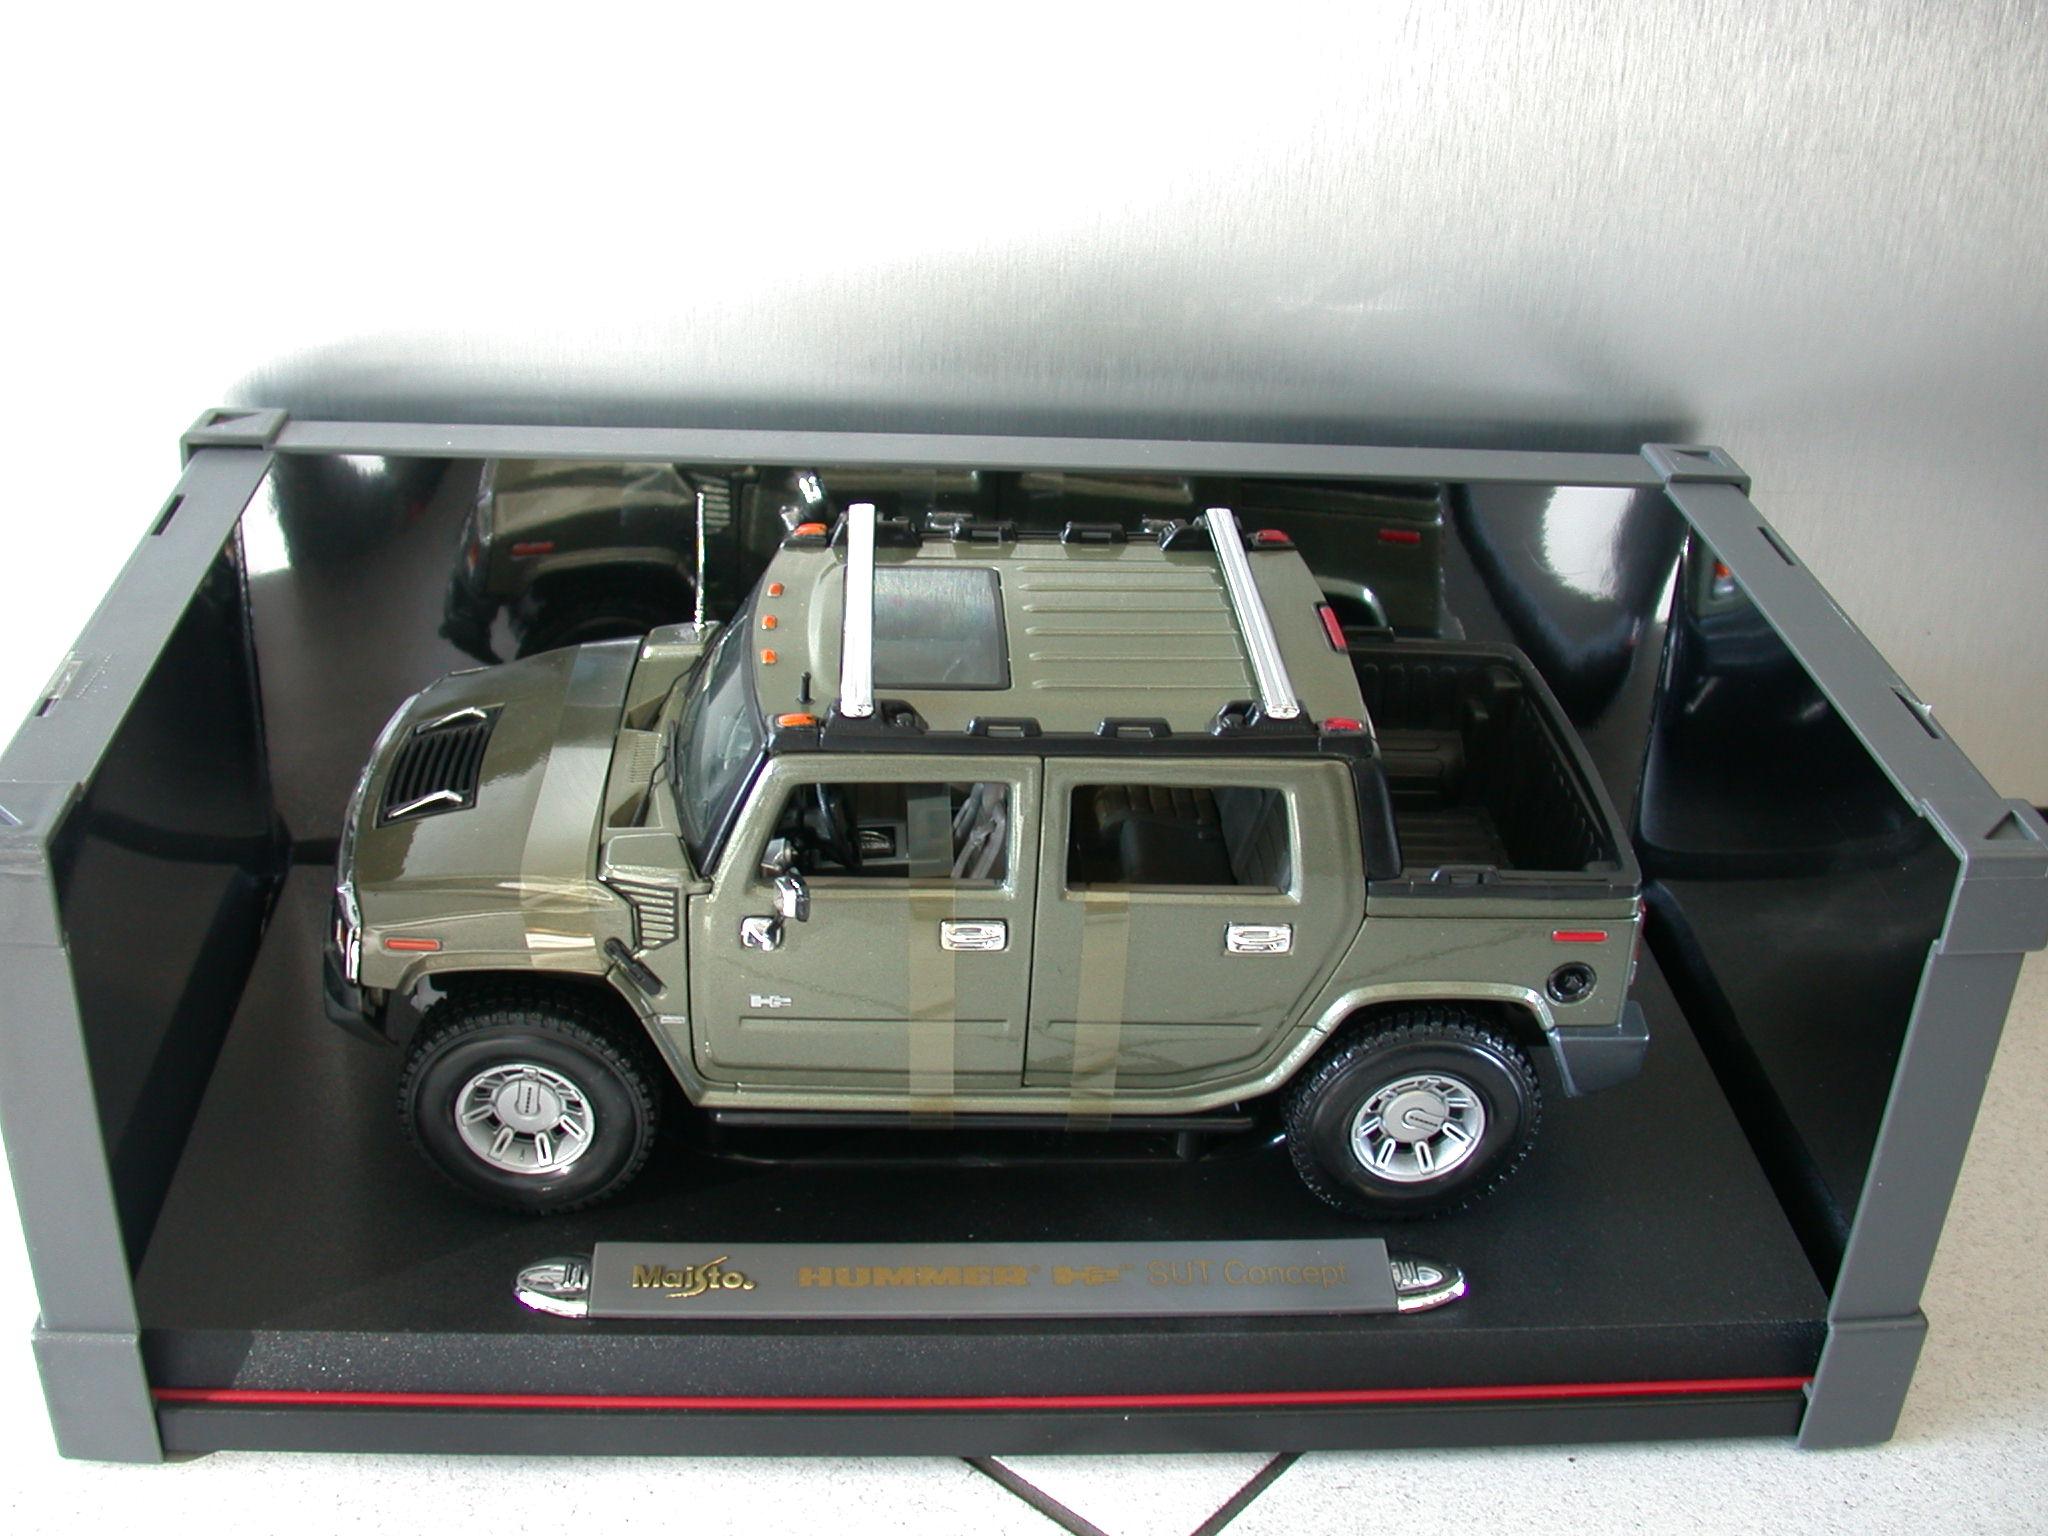 1:18 H2 SUT Modell